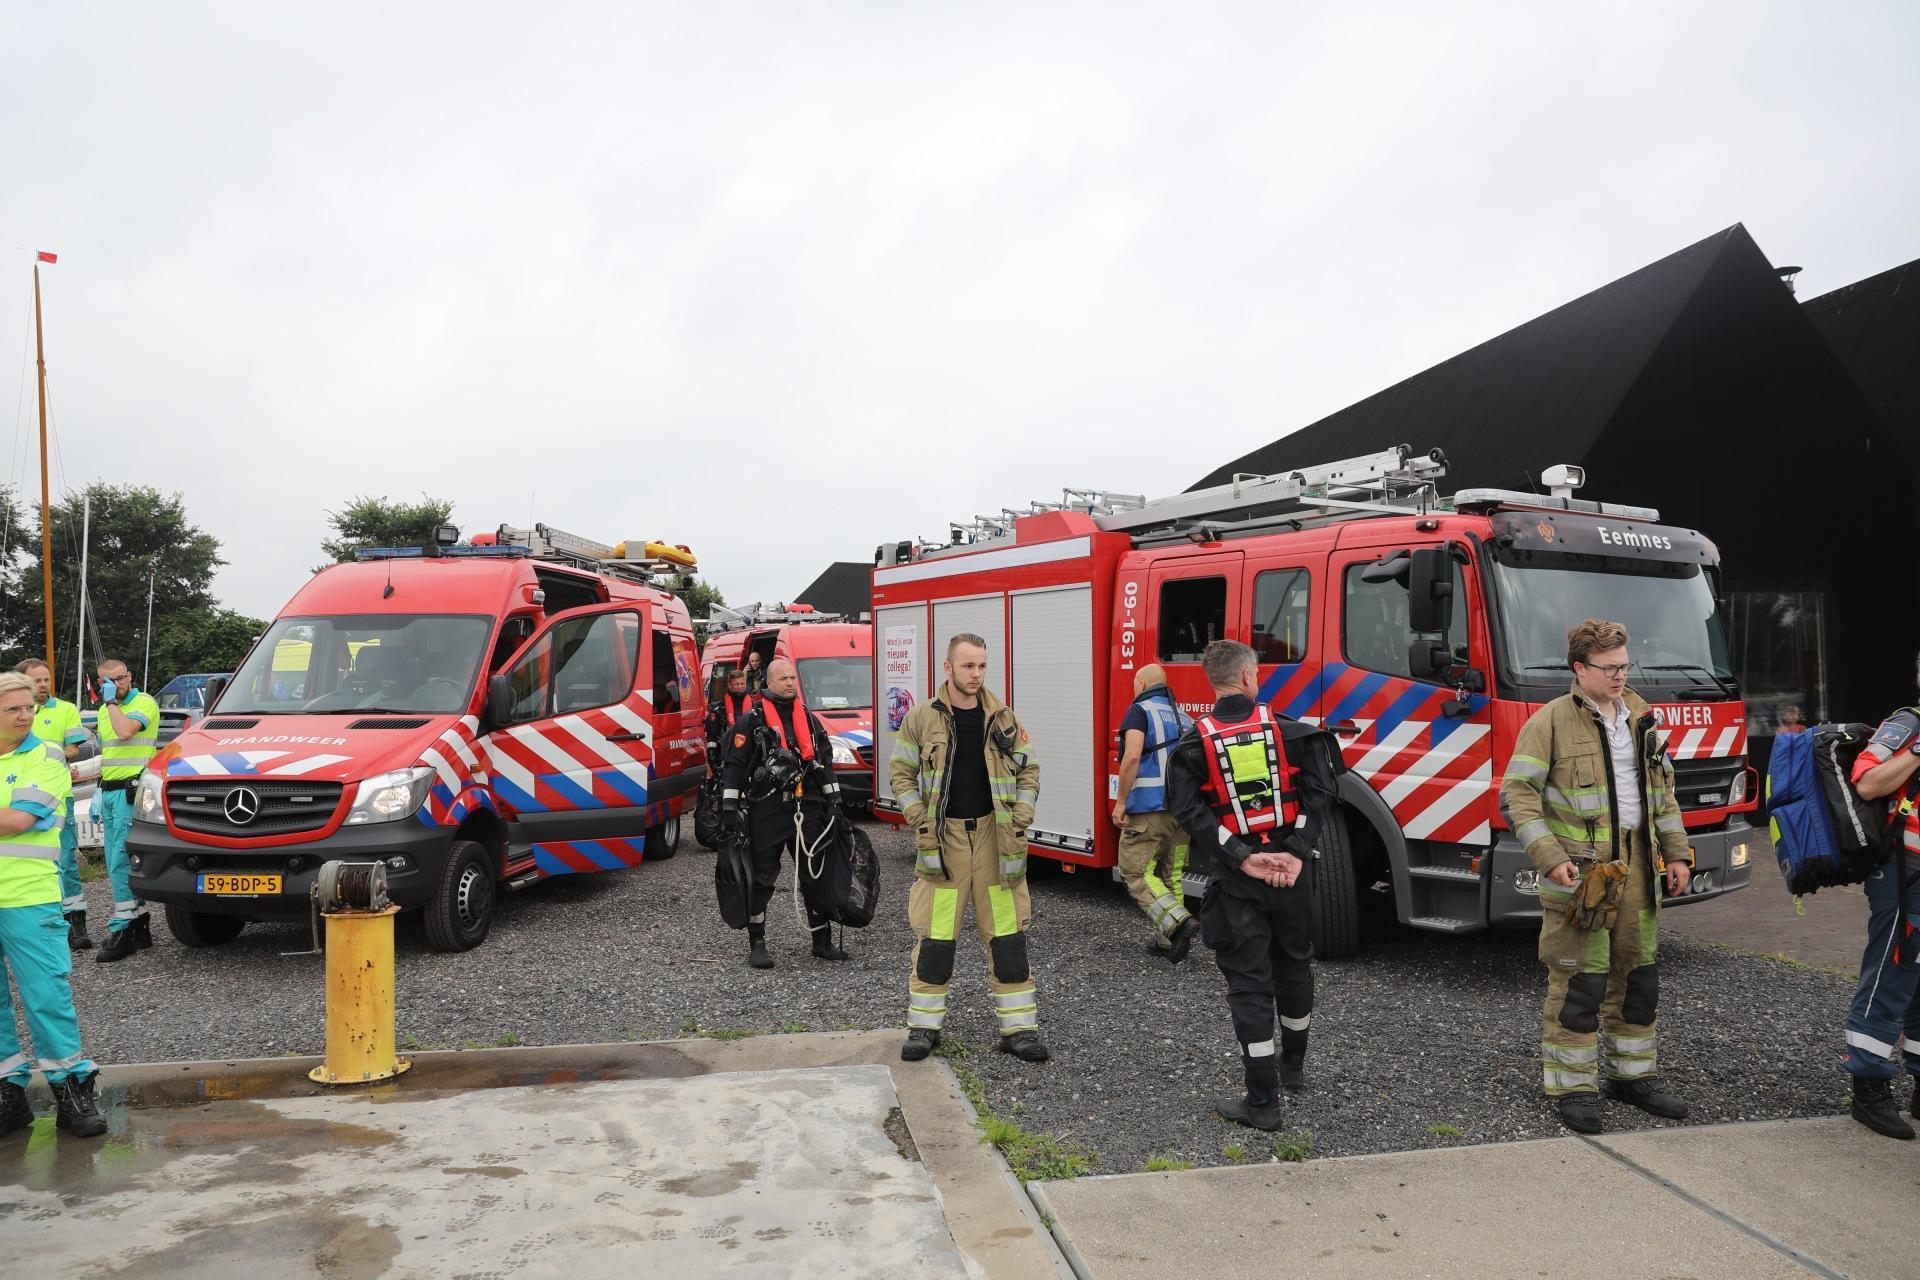 Grote hulpactie op Eemmeer en bij jachthaven 't Raboes in Eemnes na melding diefstal boot en man te water